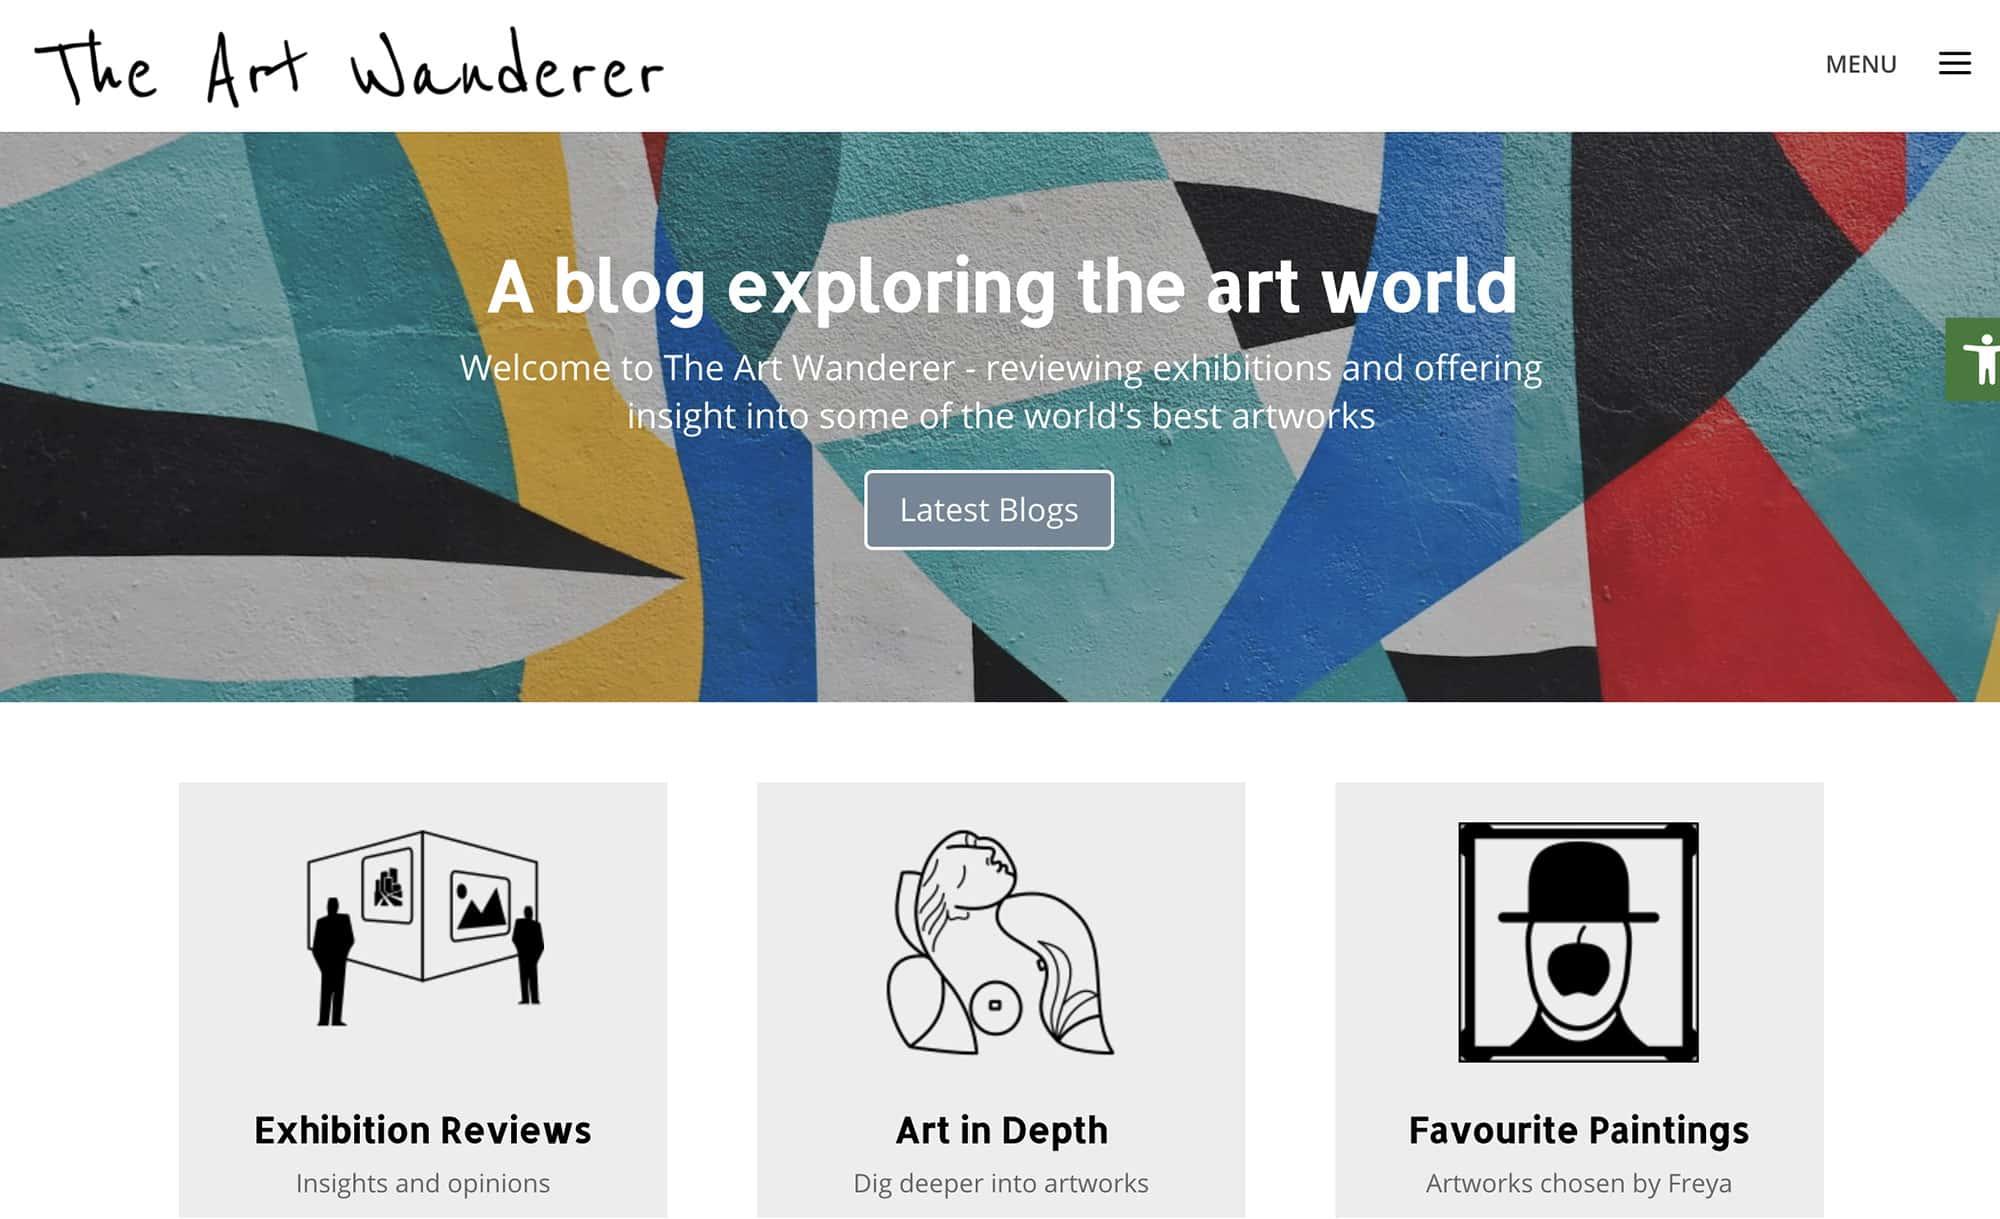 The Art Wanderer website homepage